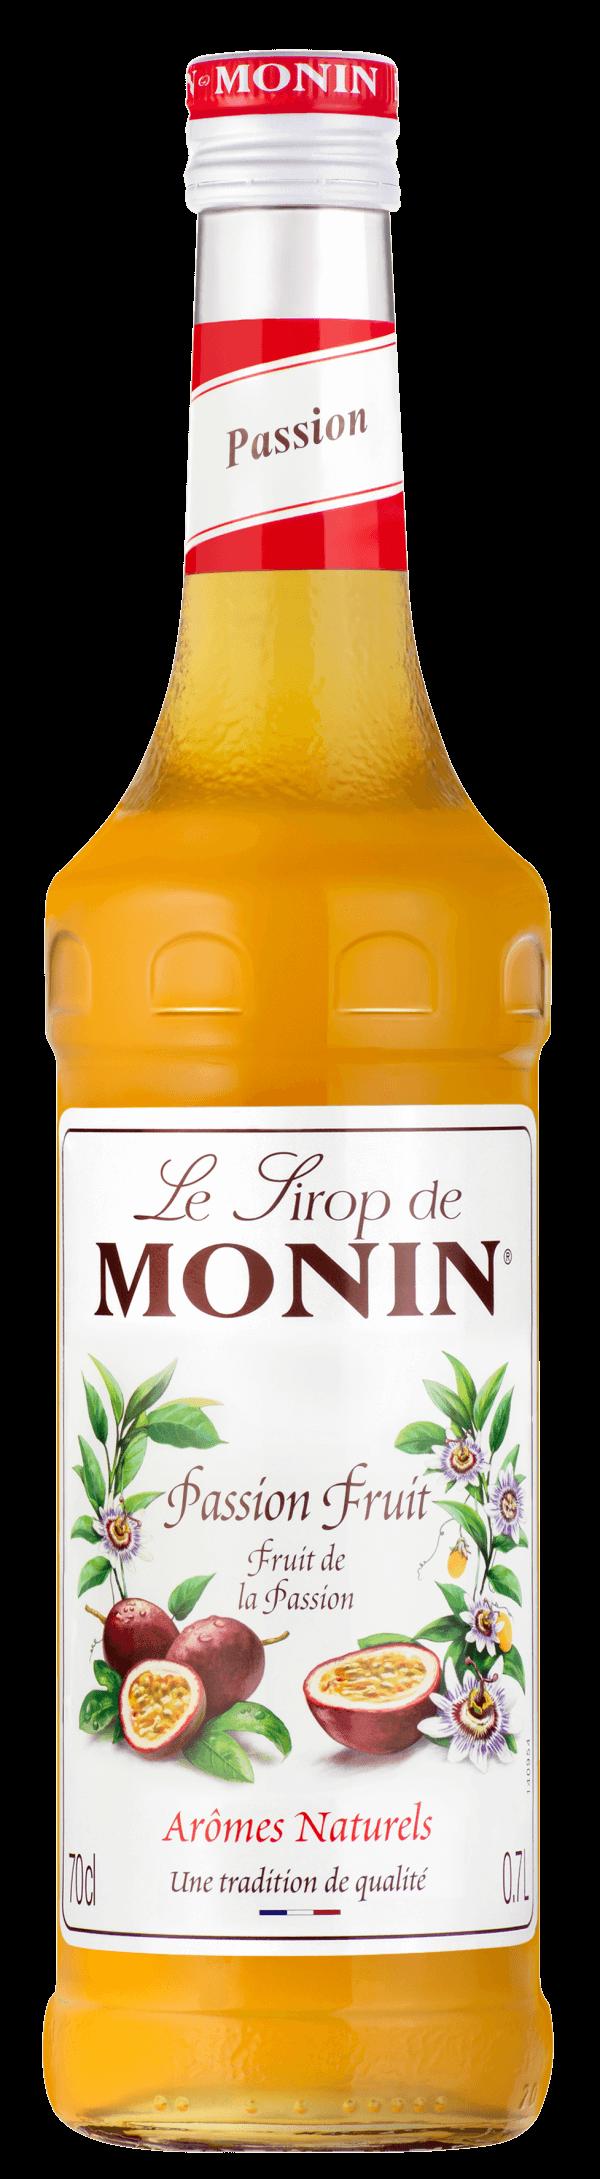 Monin_Passion_Fruit